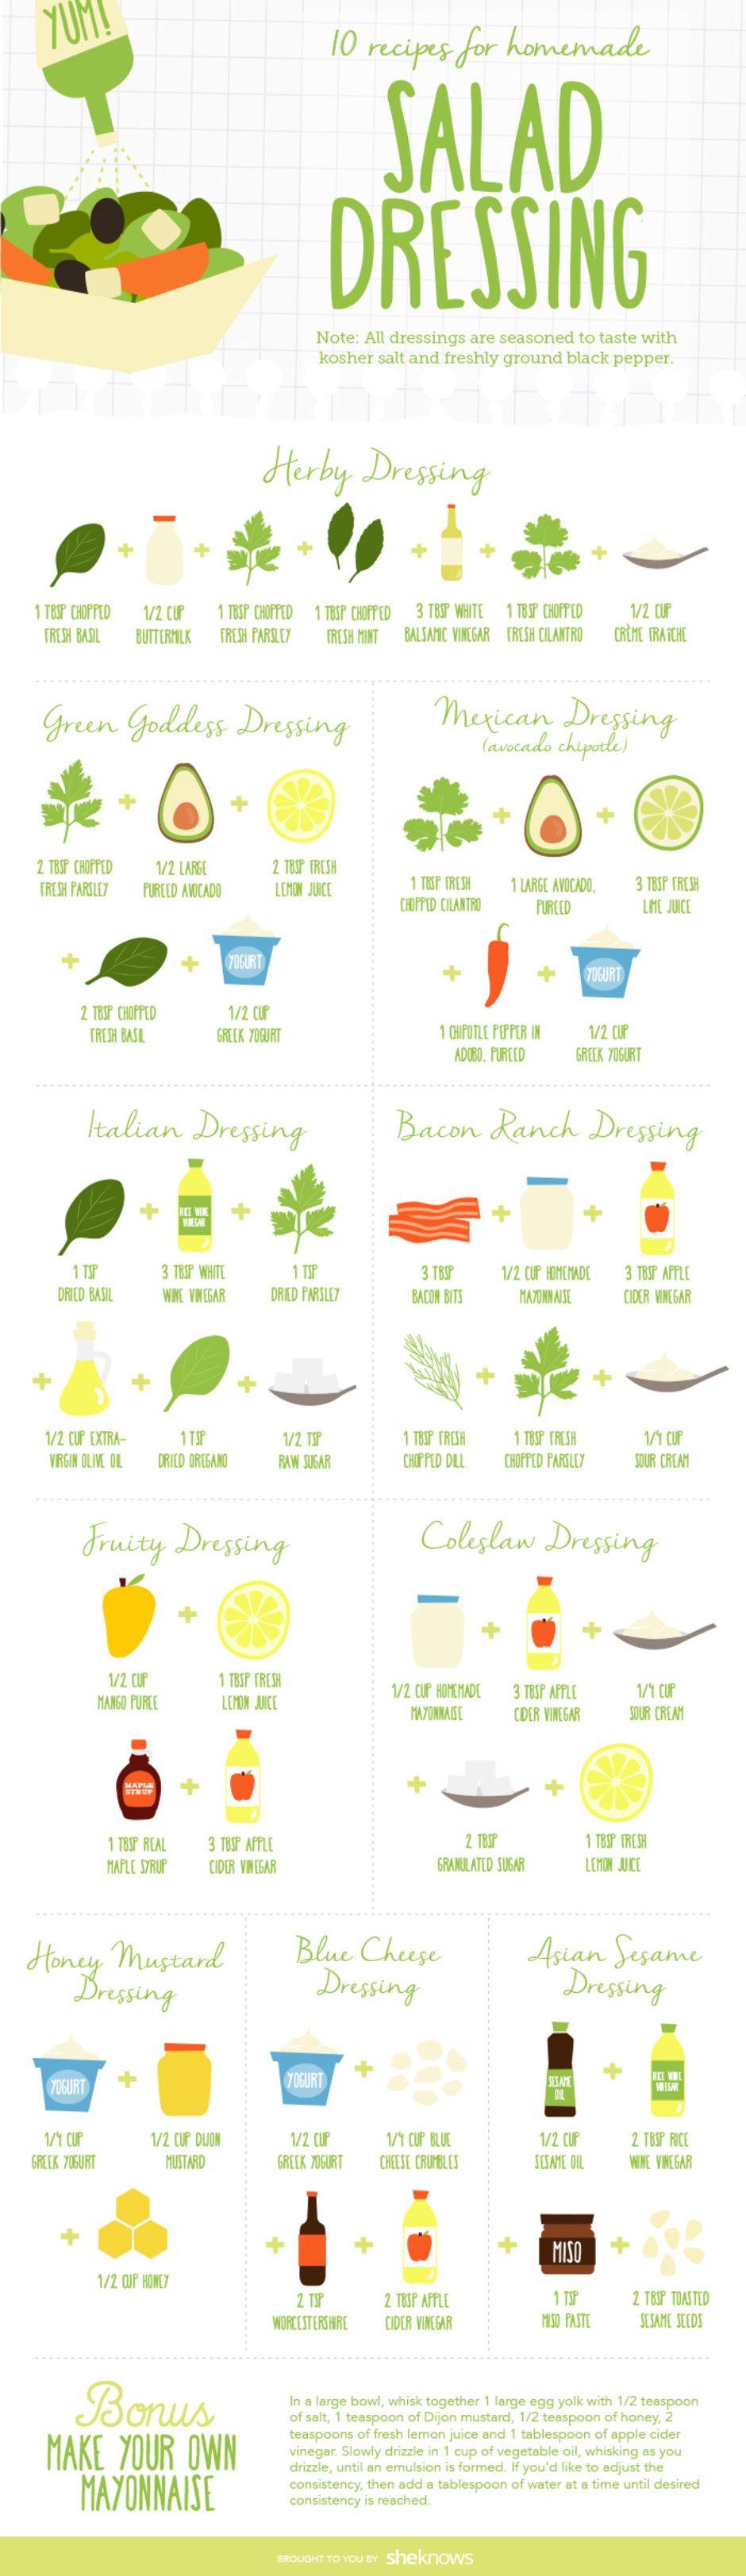 18 Salad & Salad Dressing